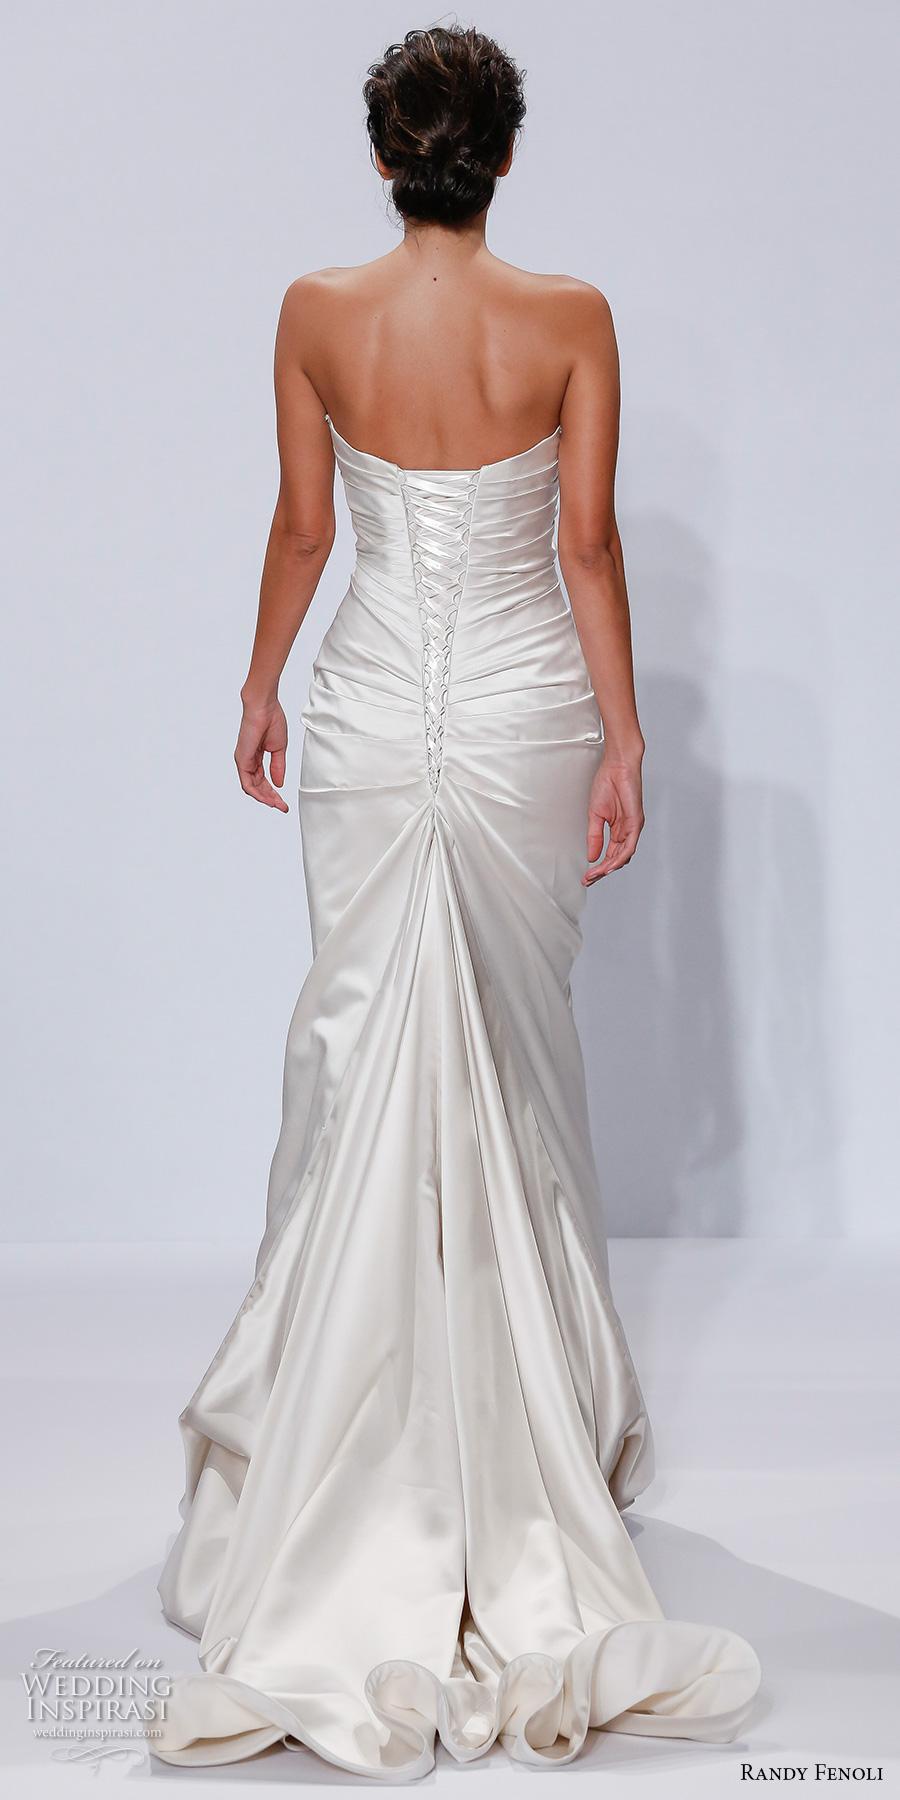 randy fenoli spring 2018 bridal strapless sweetheart neckline ruched bodice satin elegant sheath wedding dress corset back chapel train (17) bv